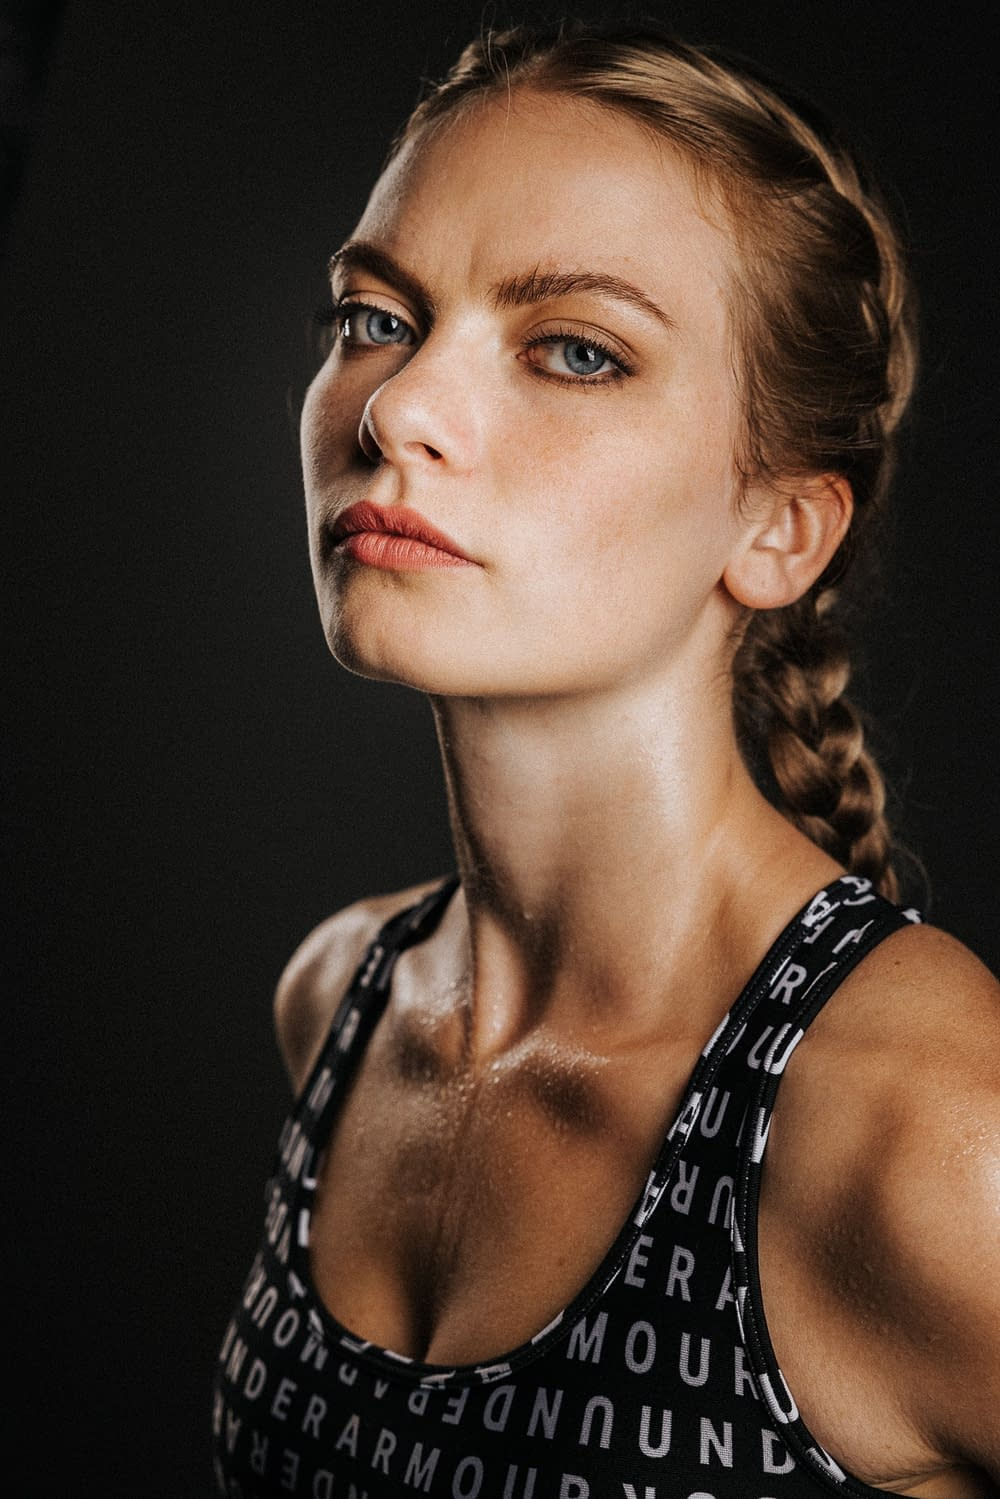 Deelia Studio Portrait - Under Armour